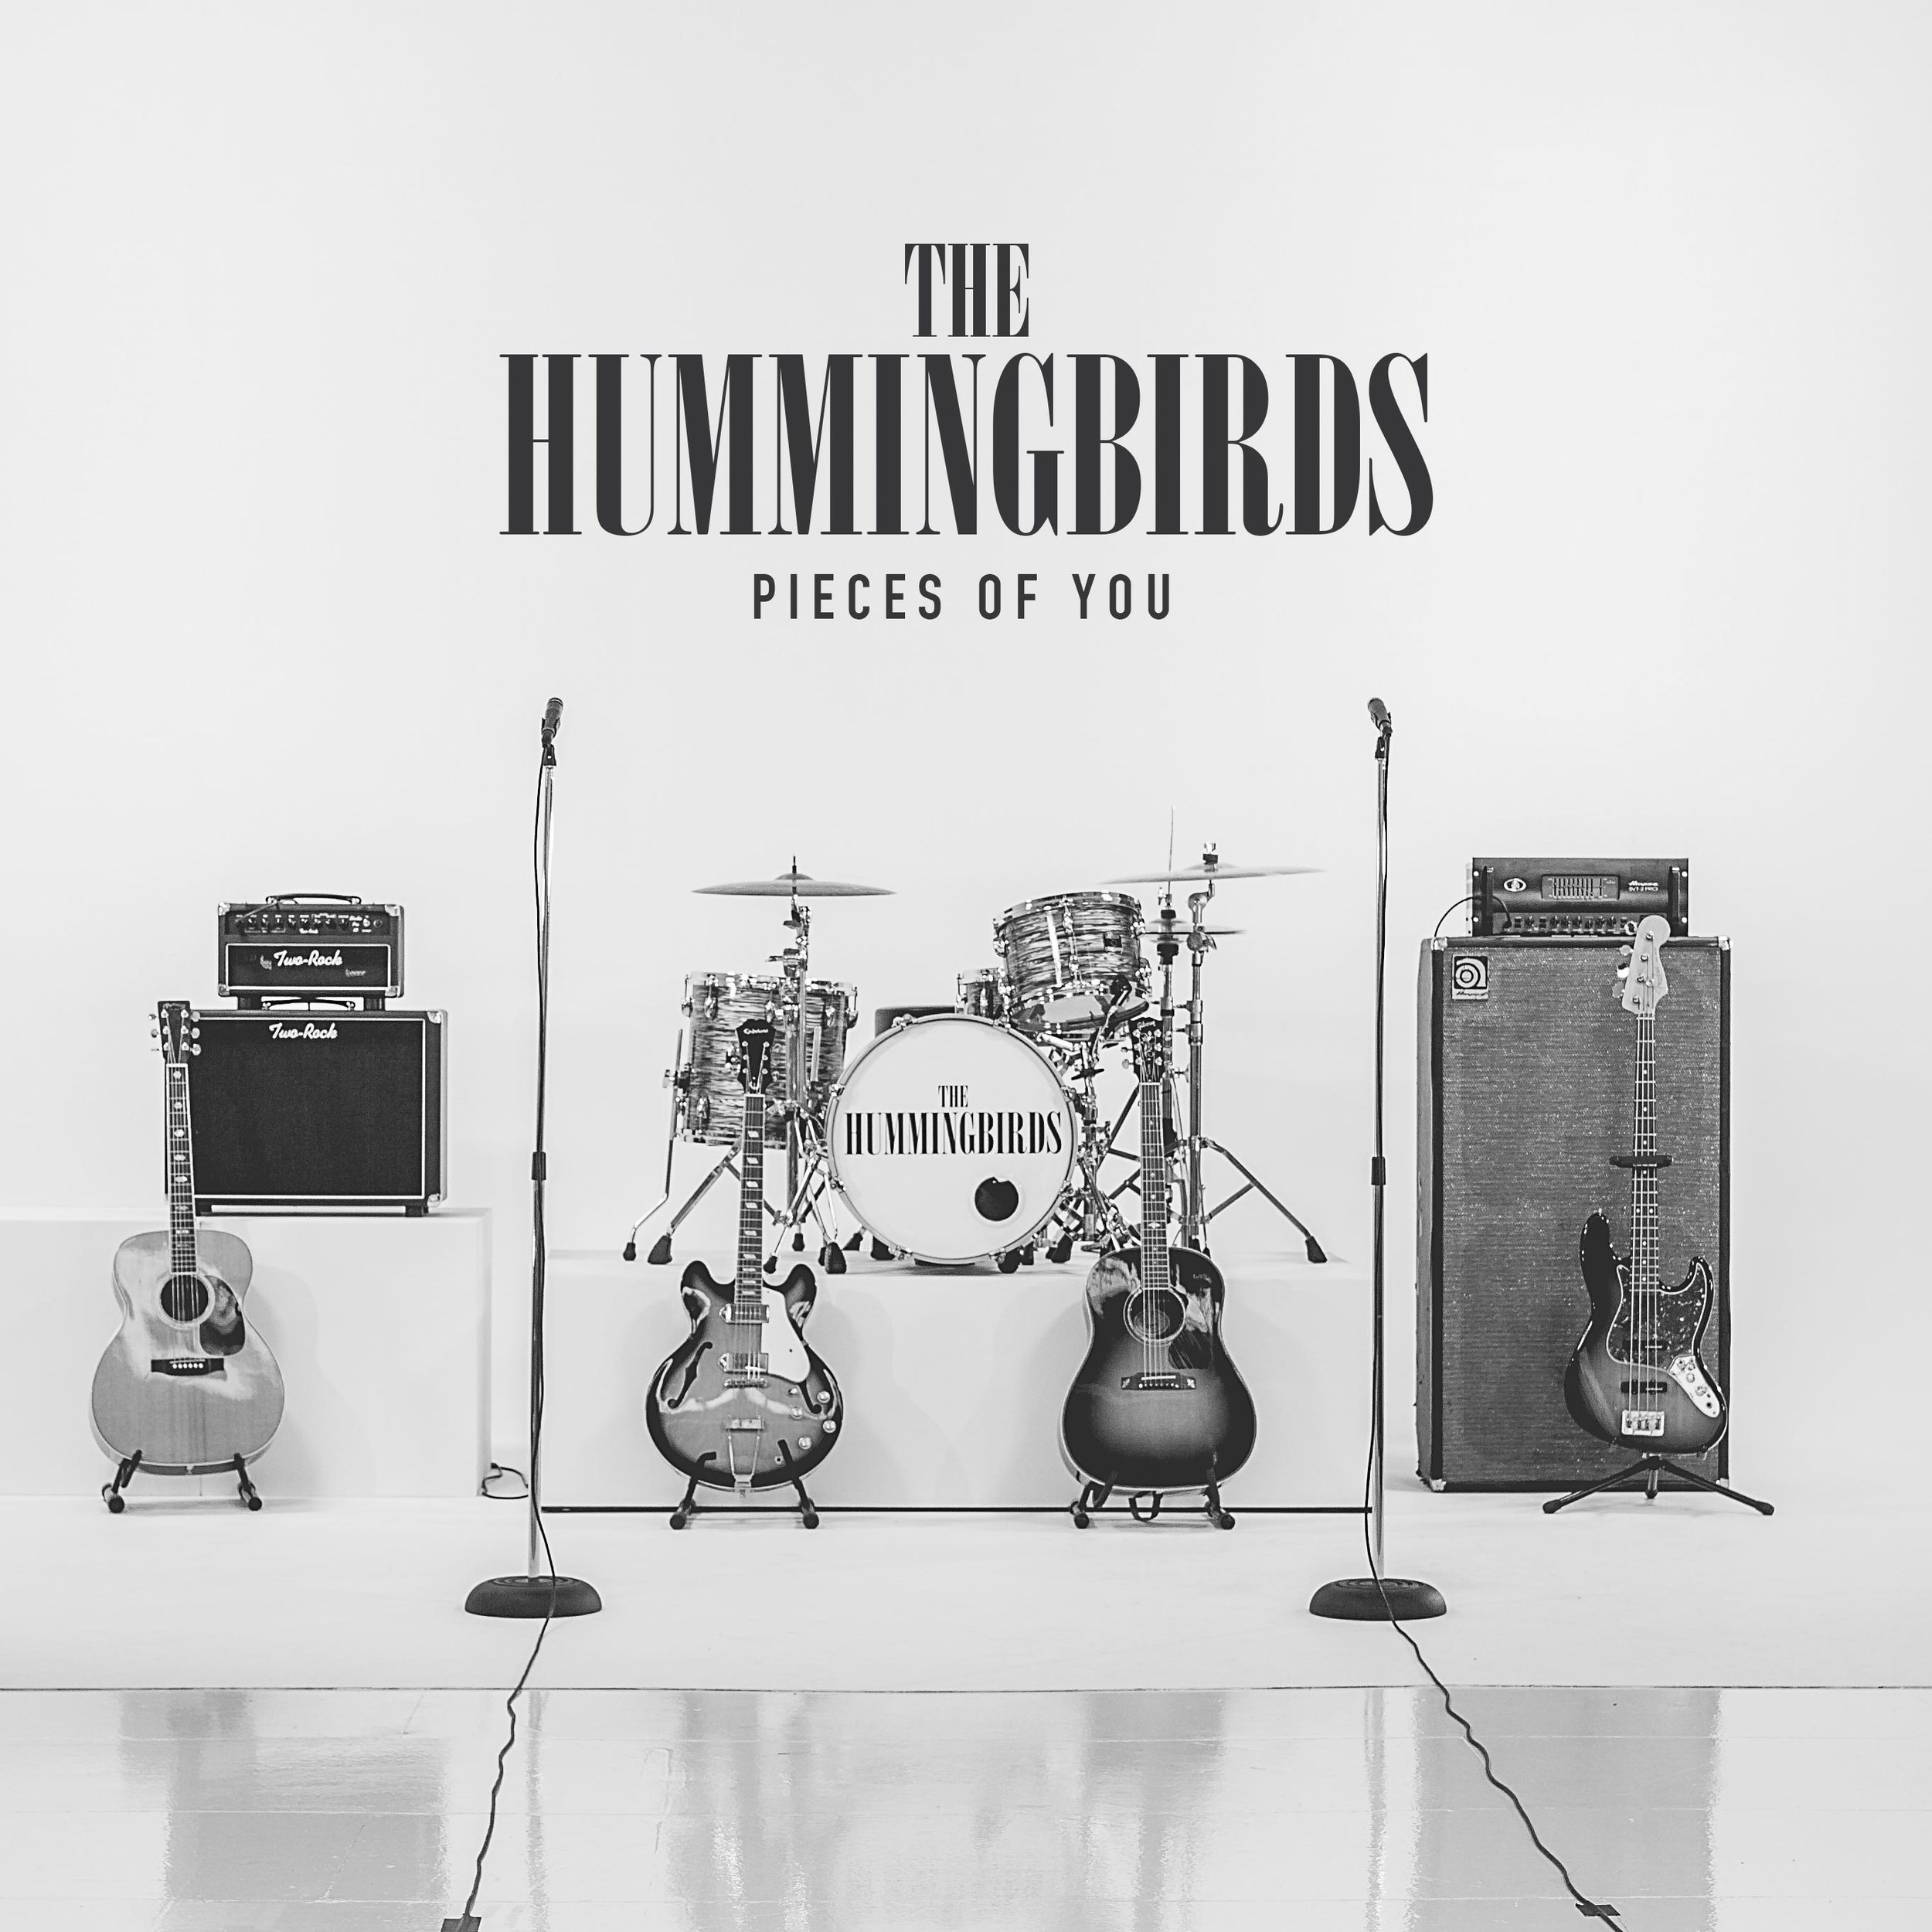 Hummingbirds - Pieces of You